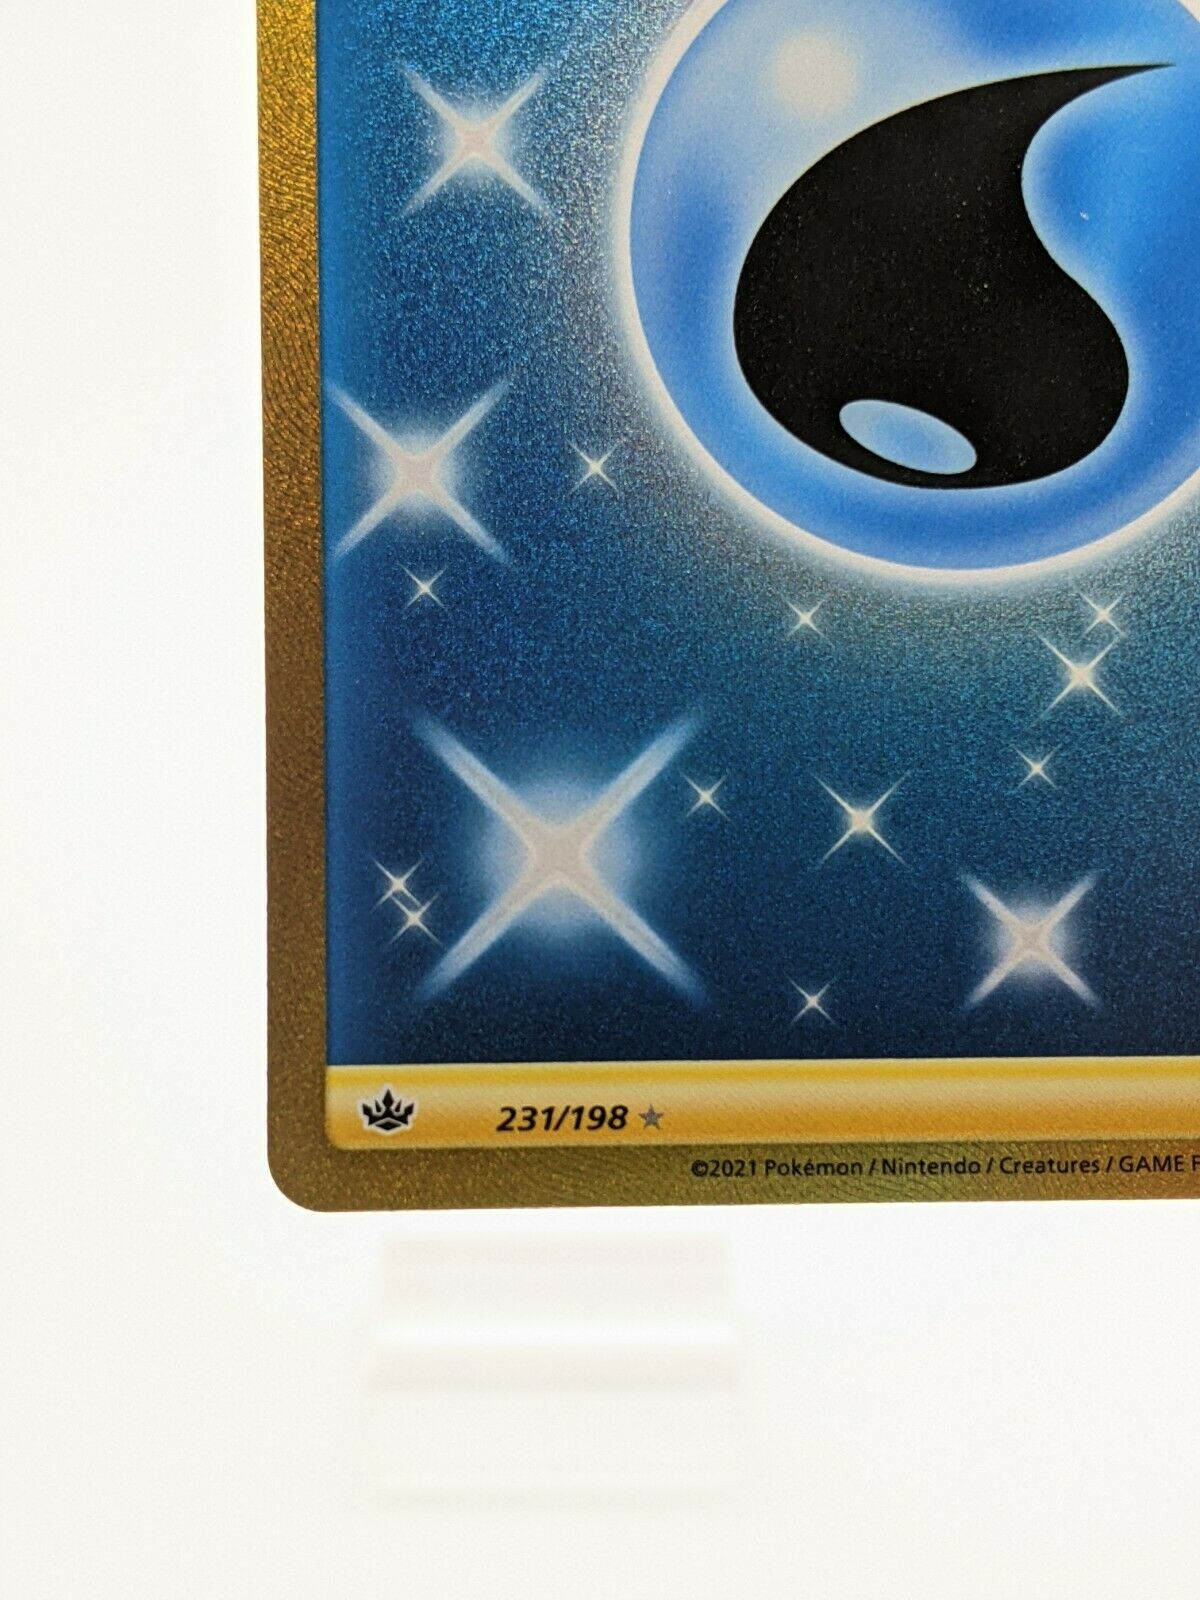 Water Energy 231/198 Chilling Reign Pokemon TCG Secret Rare NM - Image 5